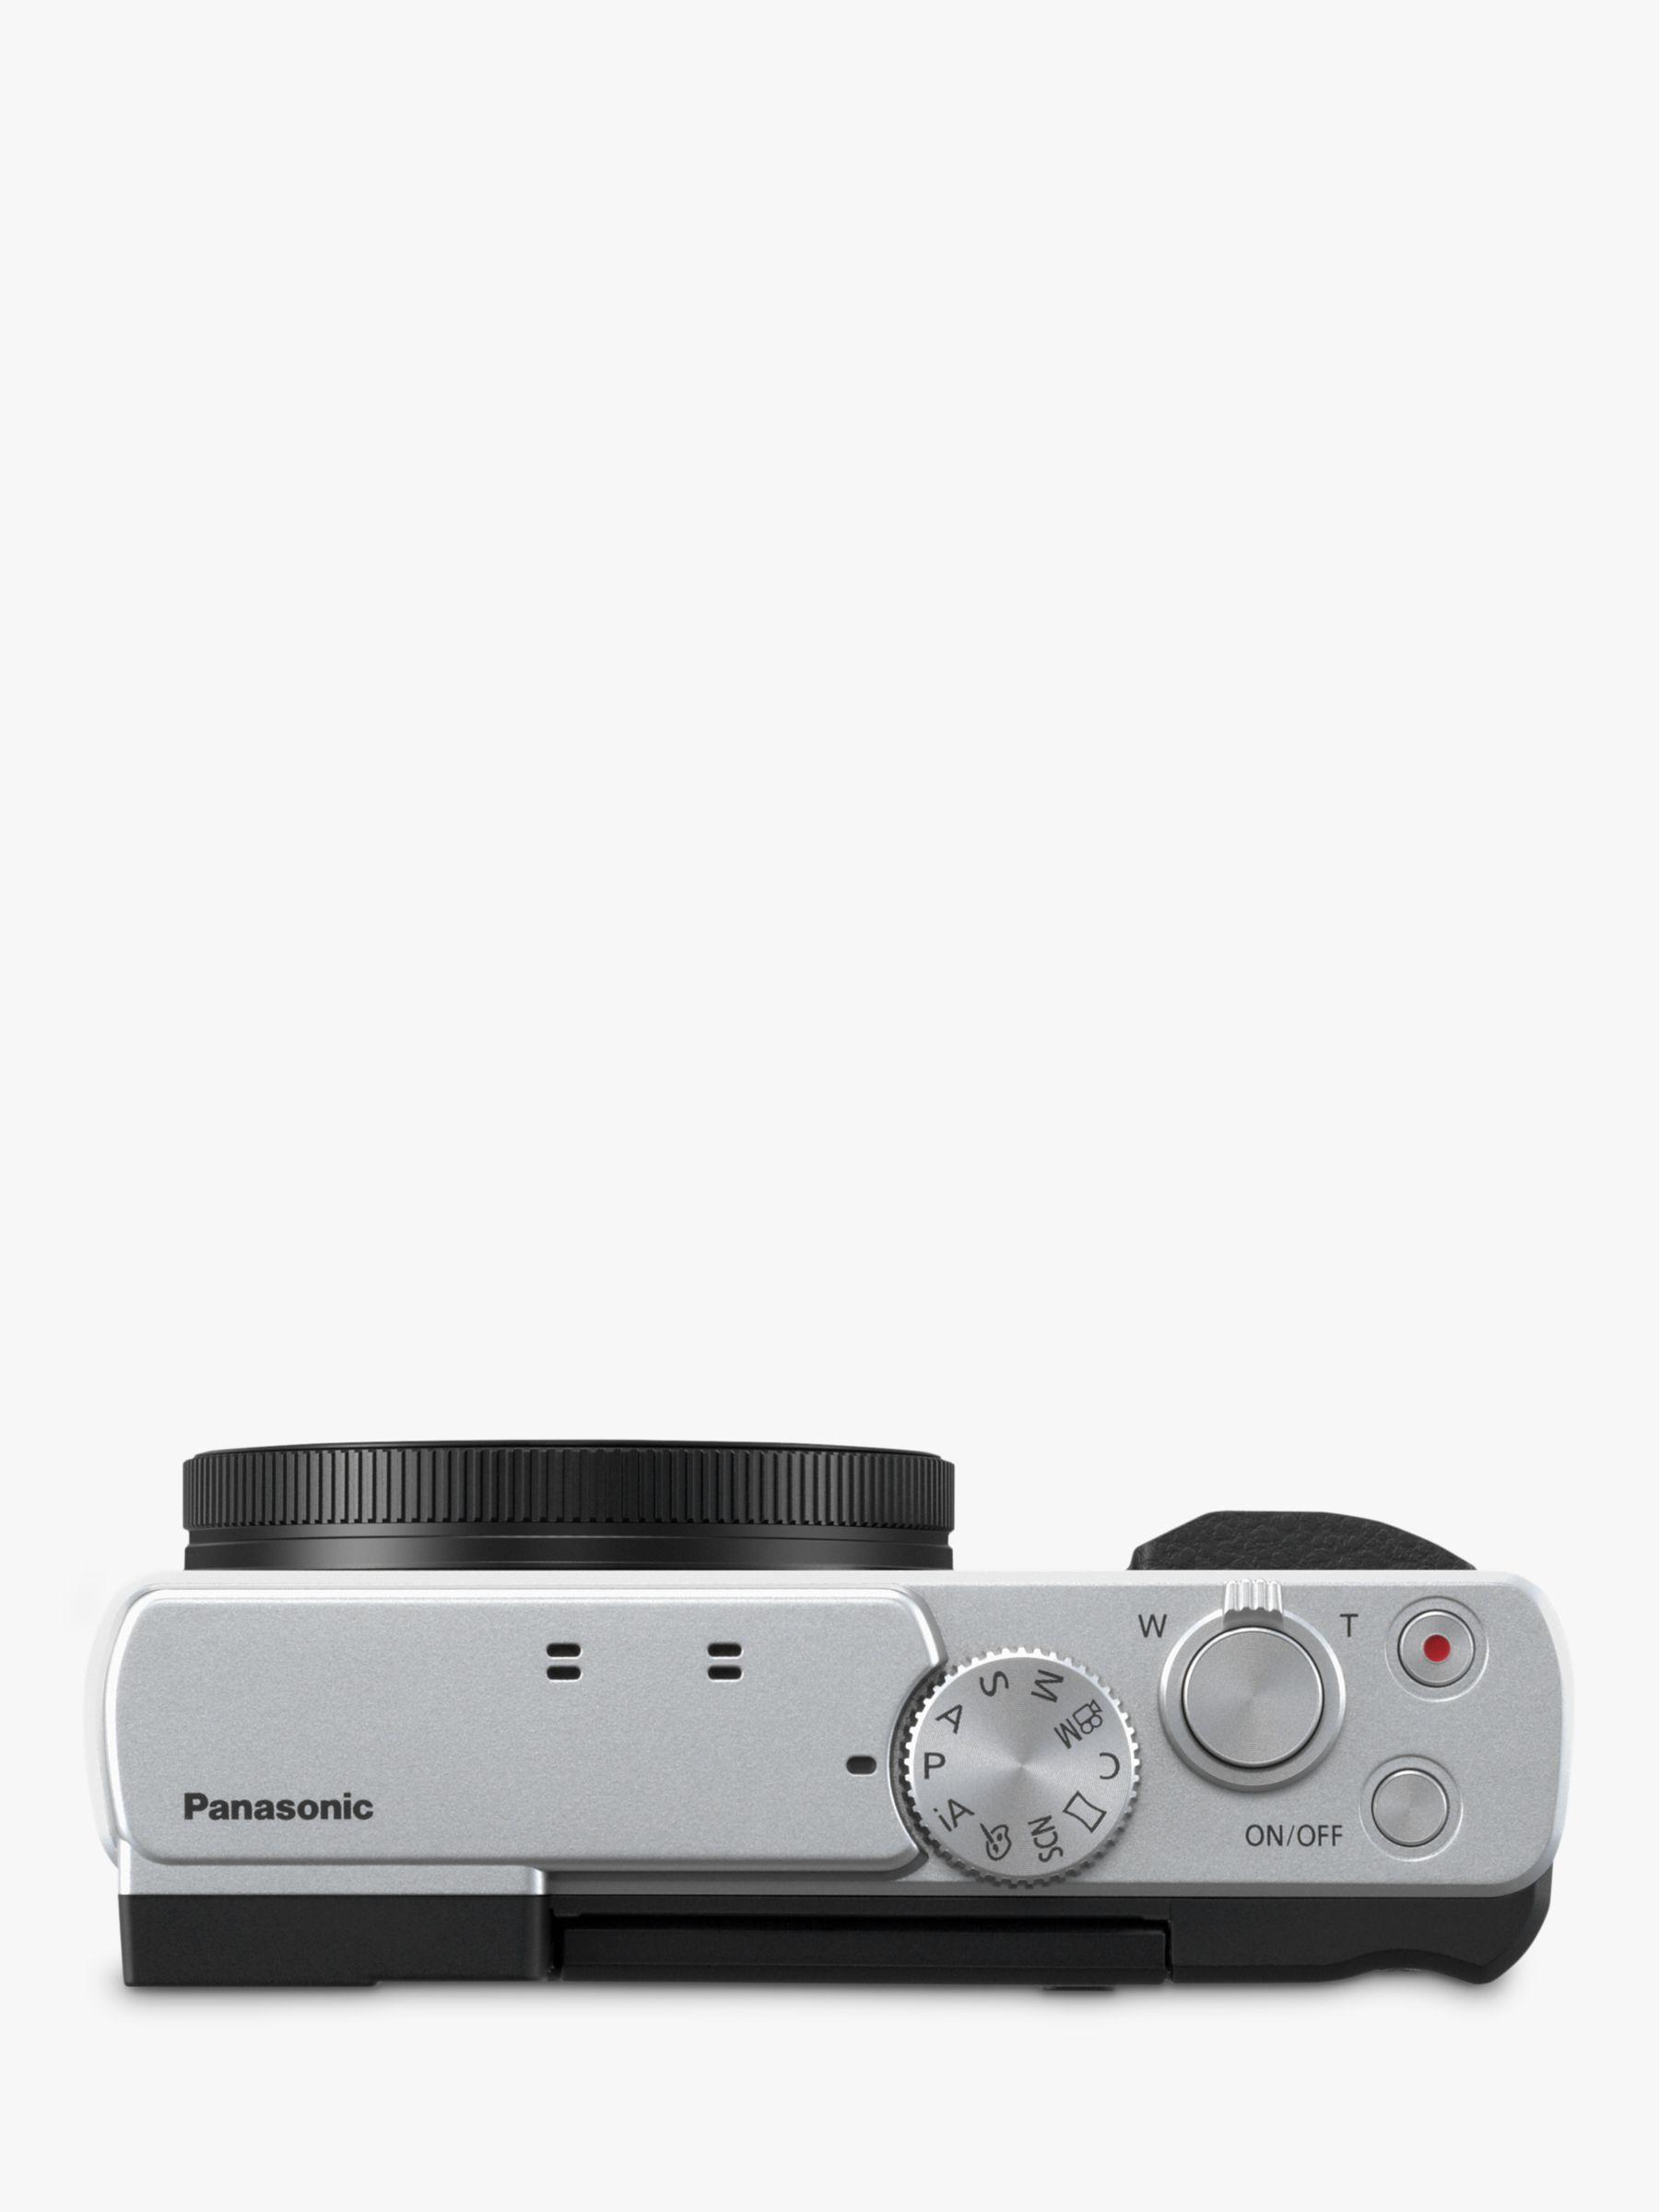 Panasonic Lumix Dc Tz95 Super Zoom Digital Camera 4k Ultra Hd